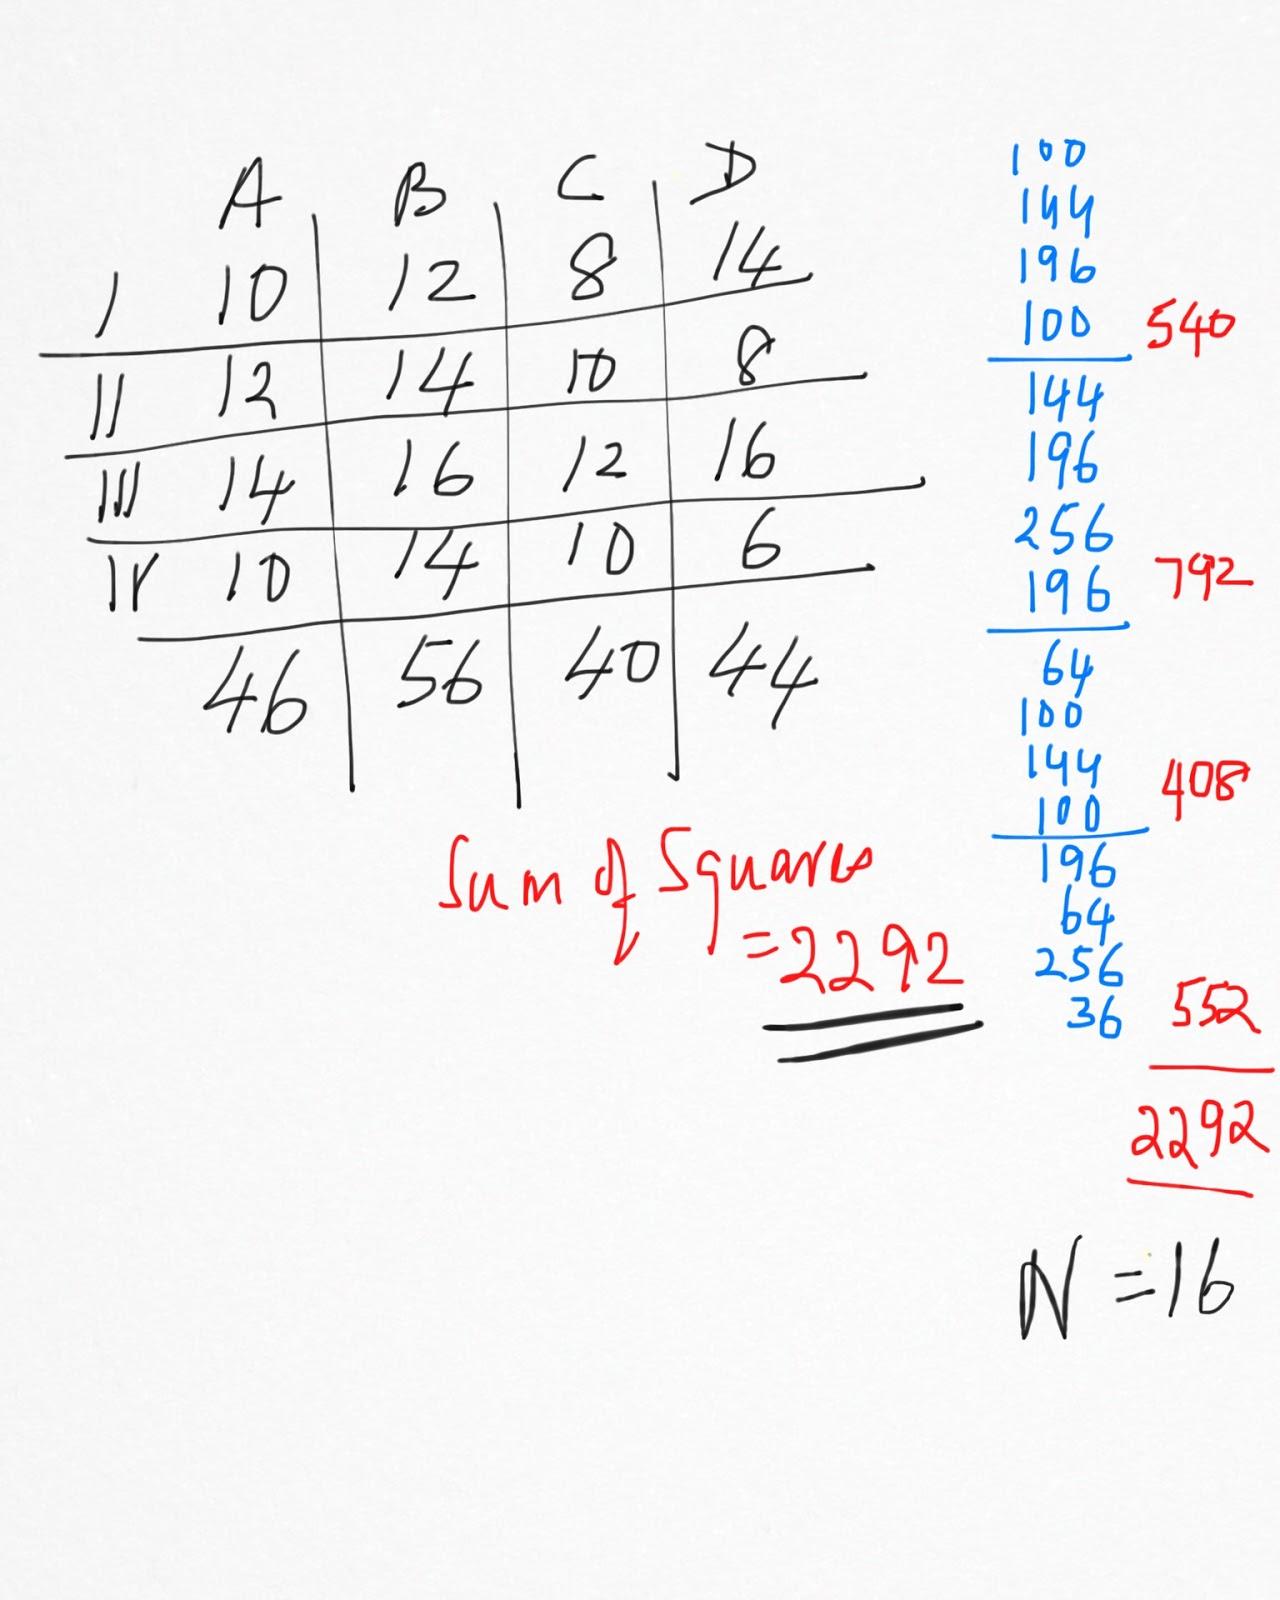 Advanced Business Statistics : ANOVA 2 way proof   class work